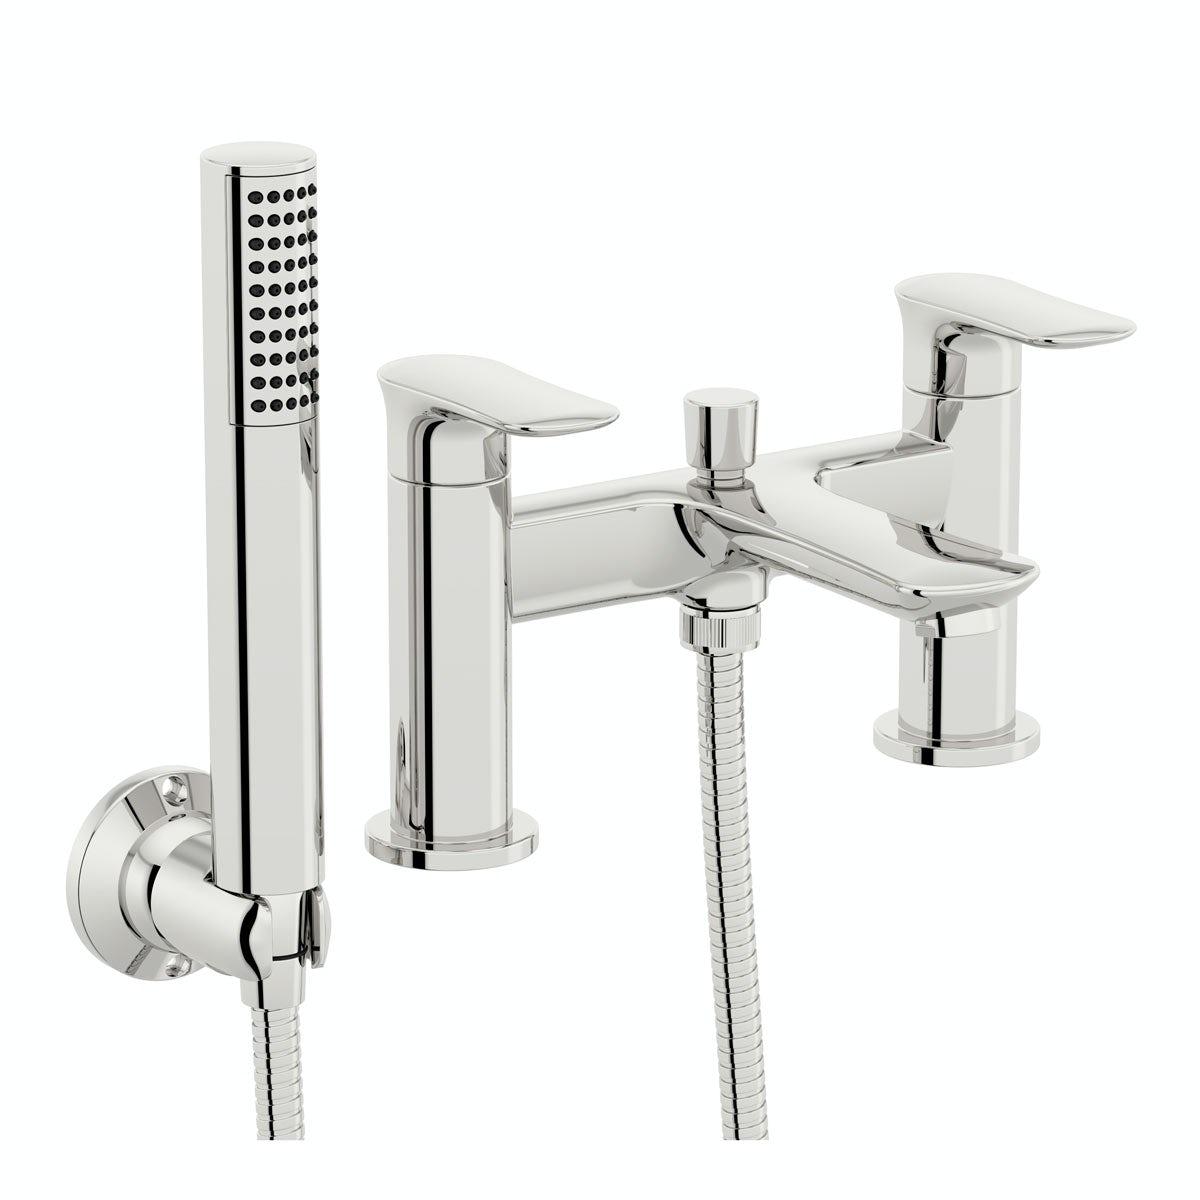 Cleanse Bath Shower Mixer